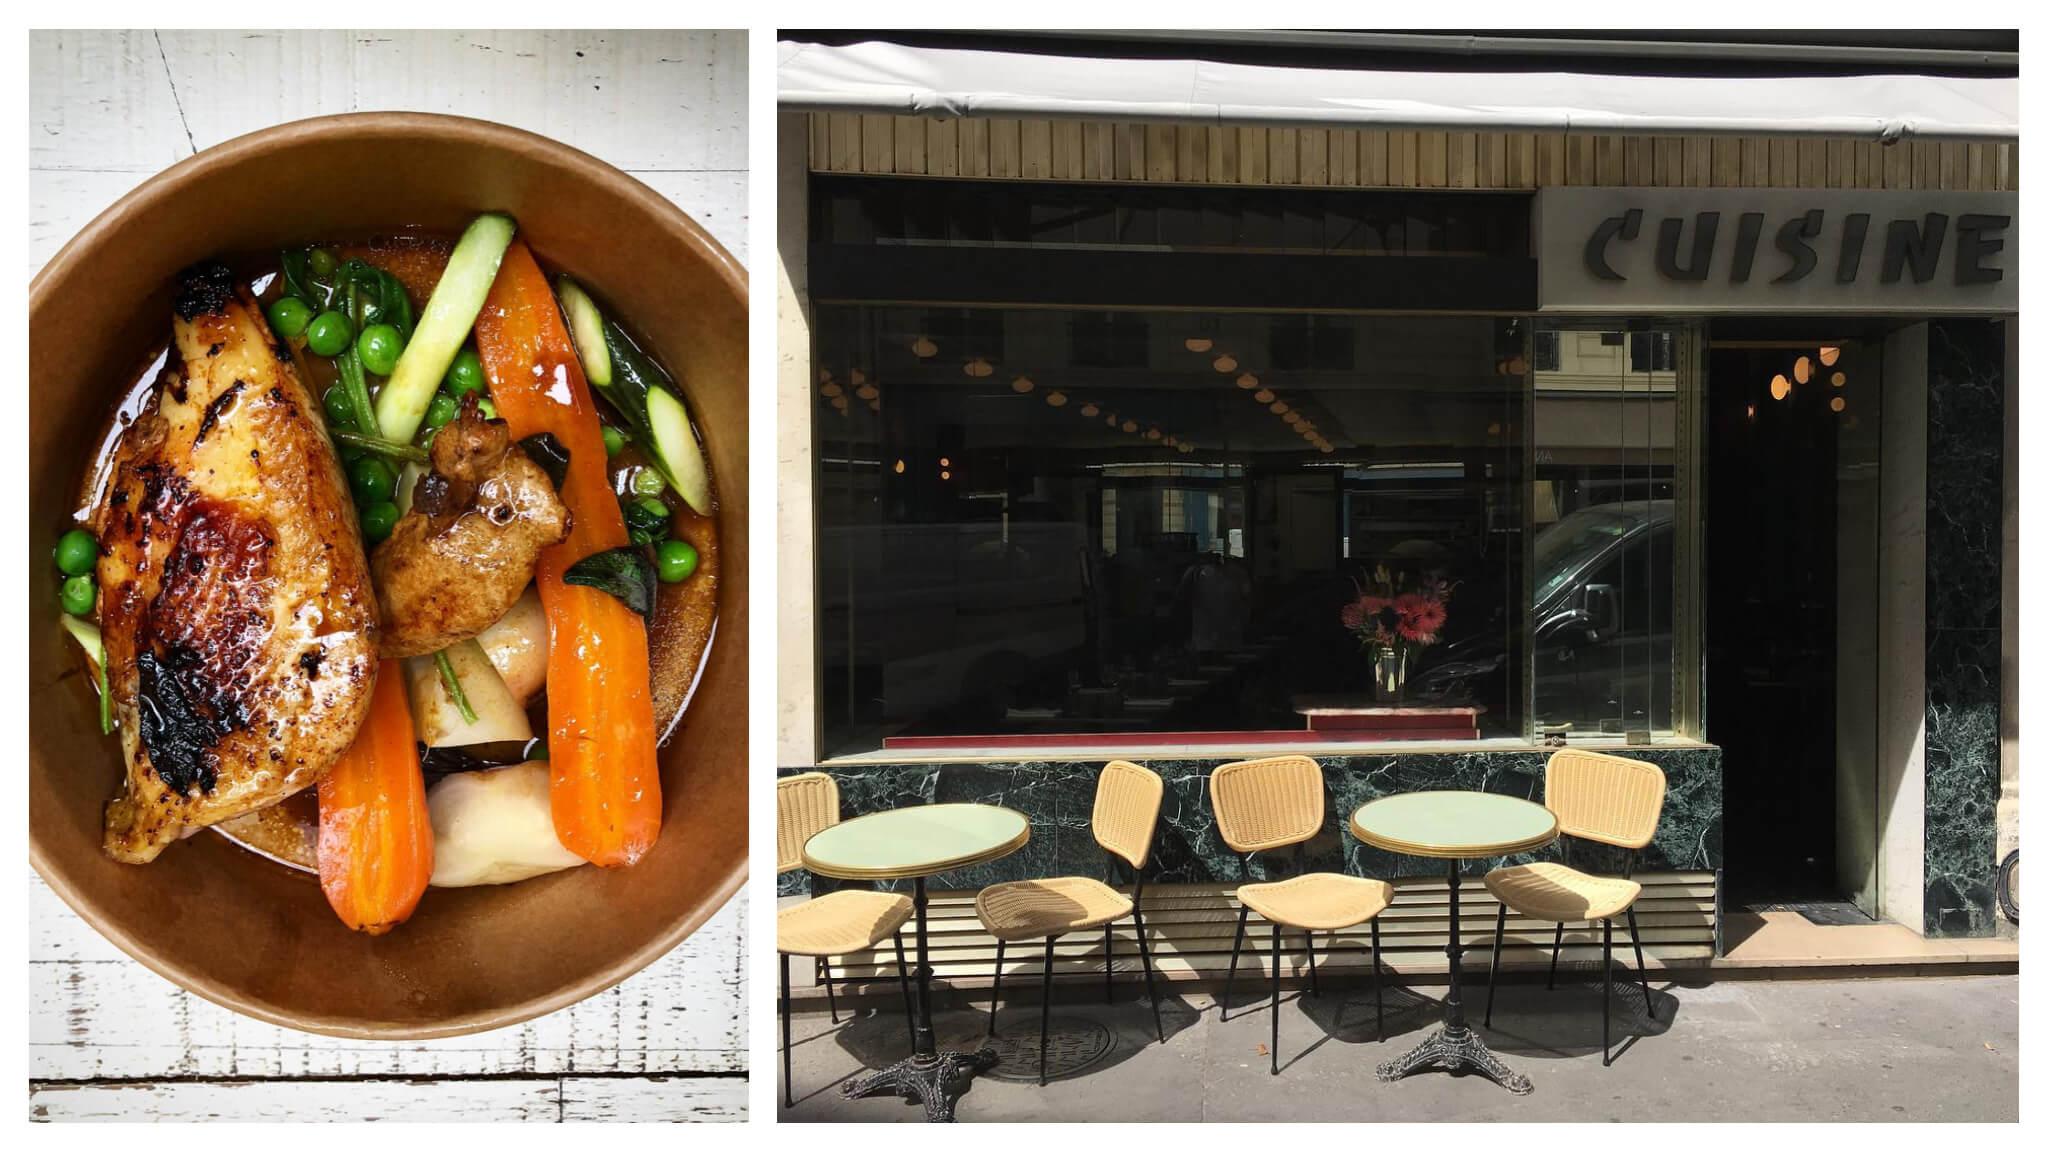 Left: a chicken and vegetable bowl from Les Enfants du Marché. Right: the terrace at Paris restaurant Cuisine.